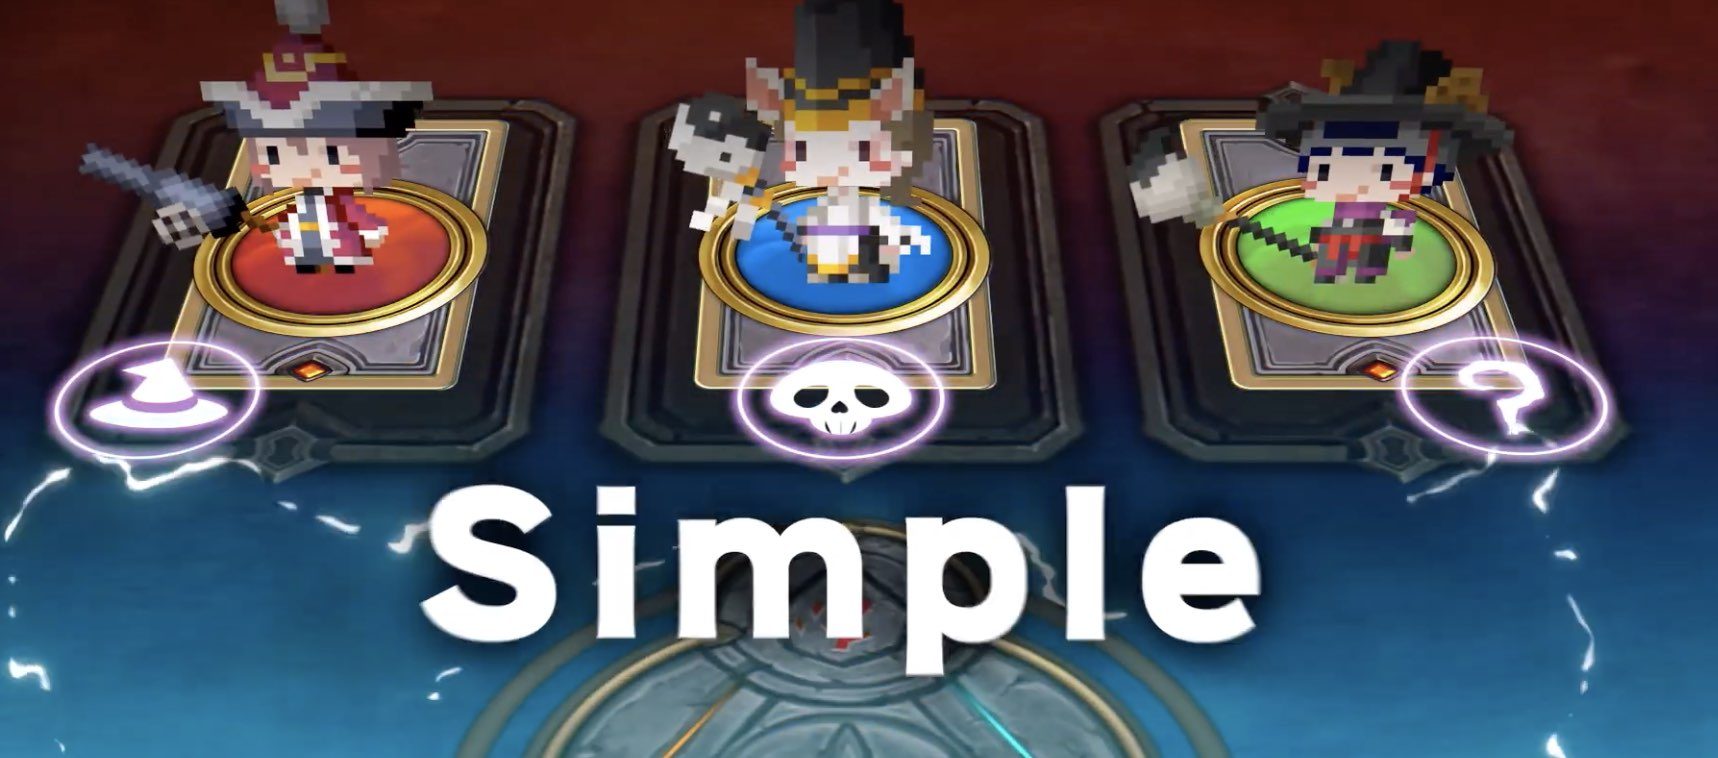 Triple Fantasy tutorial